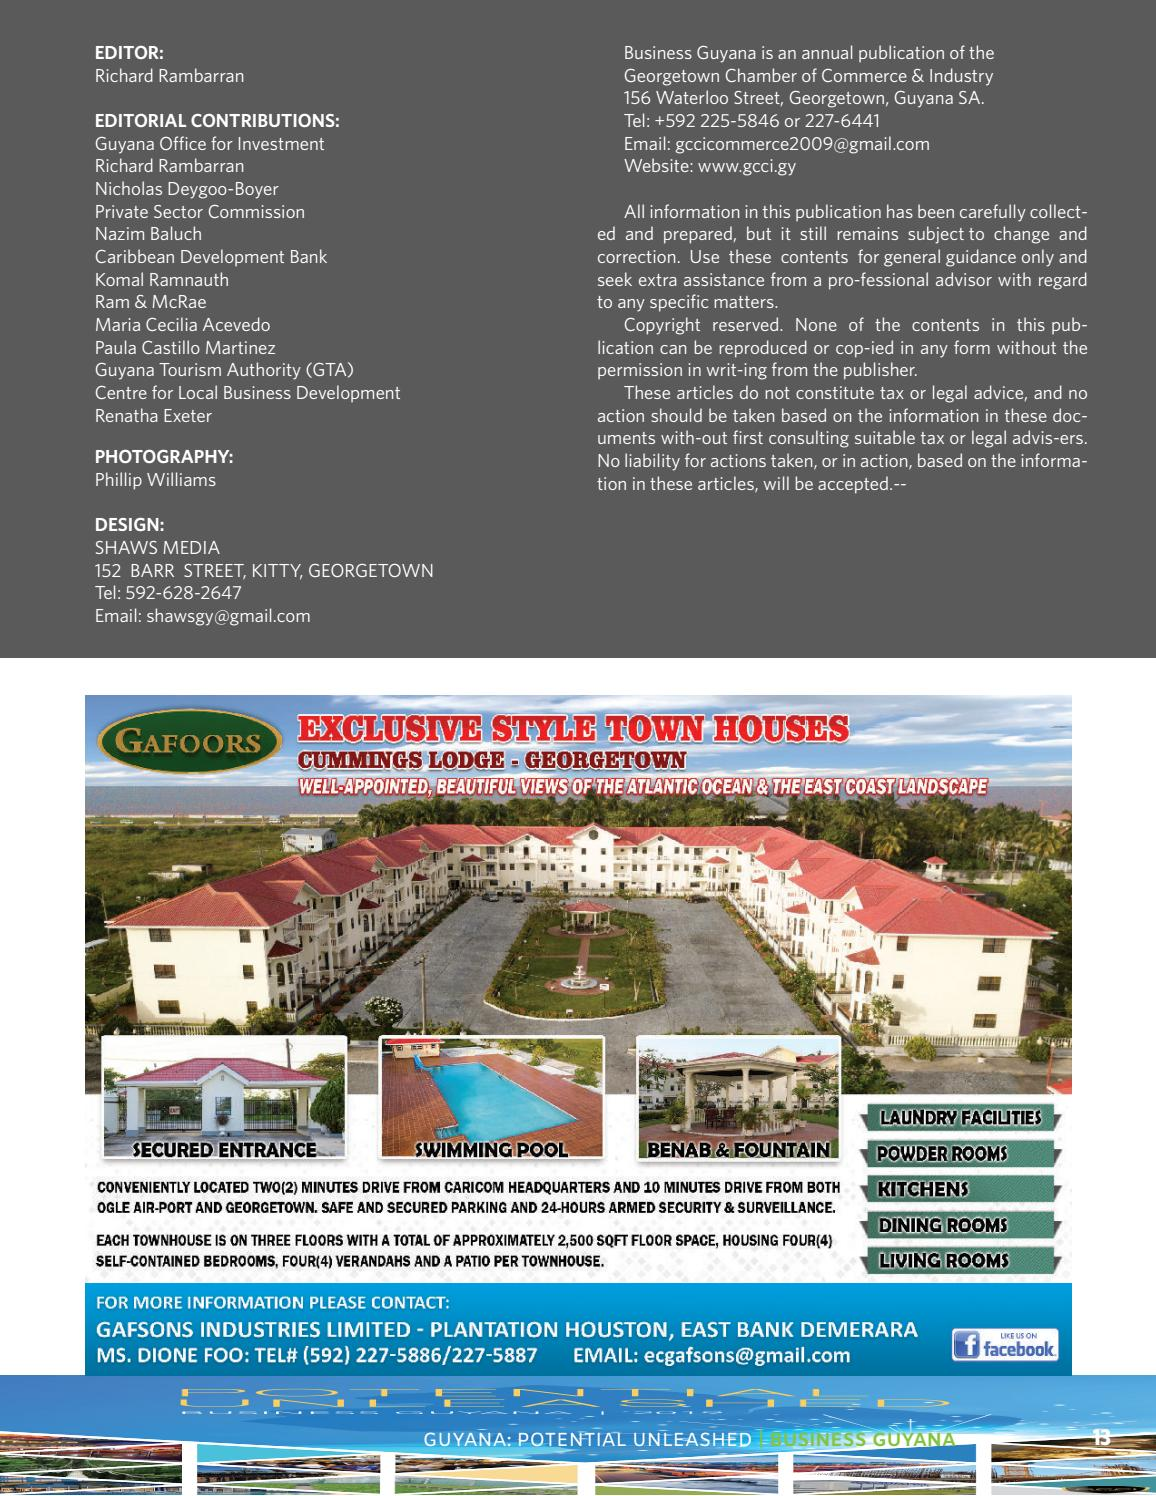 Business Guyana 2019 by GxMedia - issuu